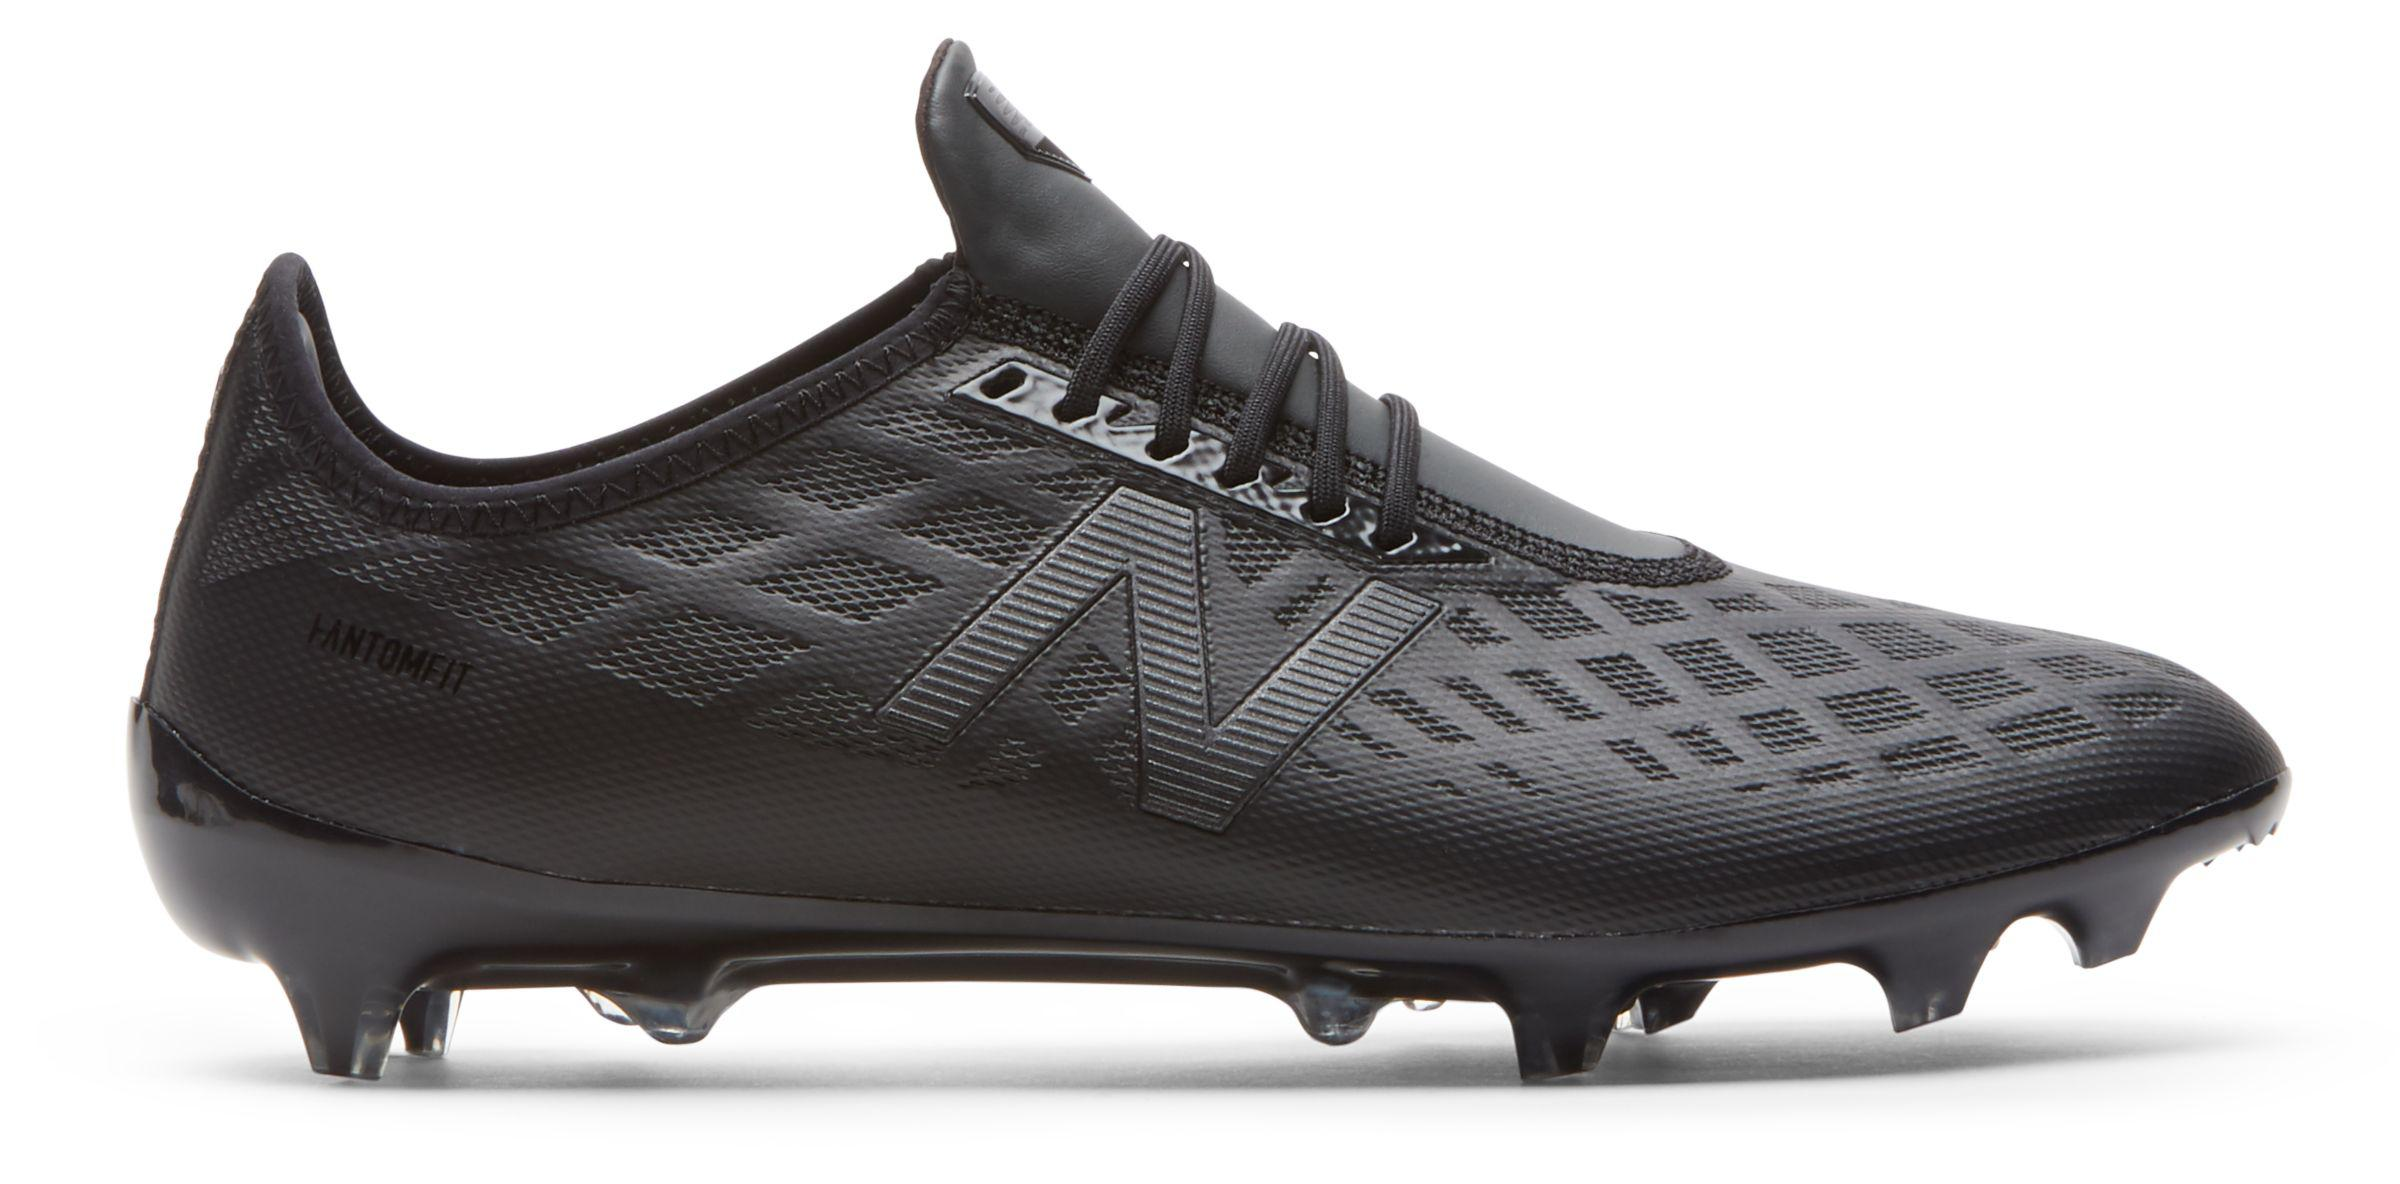 7b4e052f808 New Balance Furon V4 Pro Fg in Black for Men - Lyst